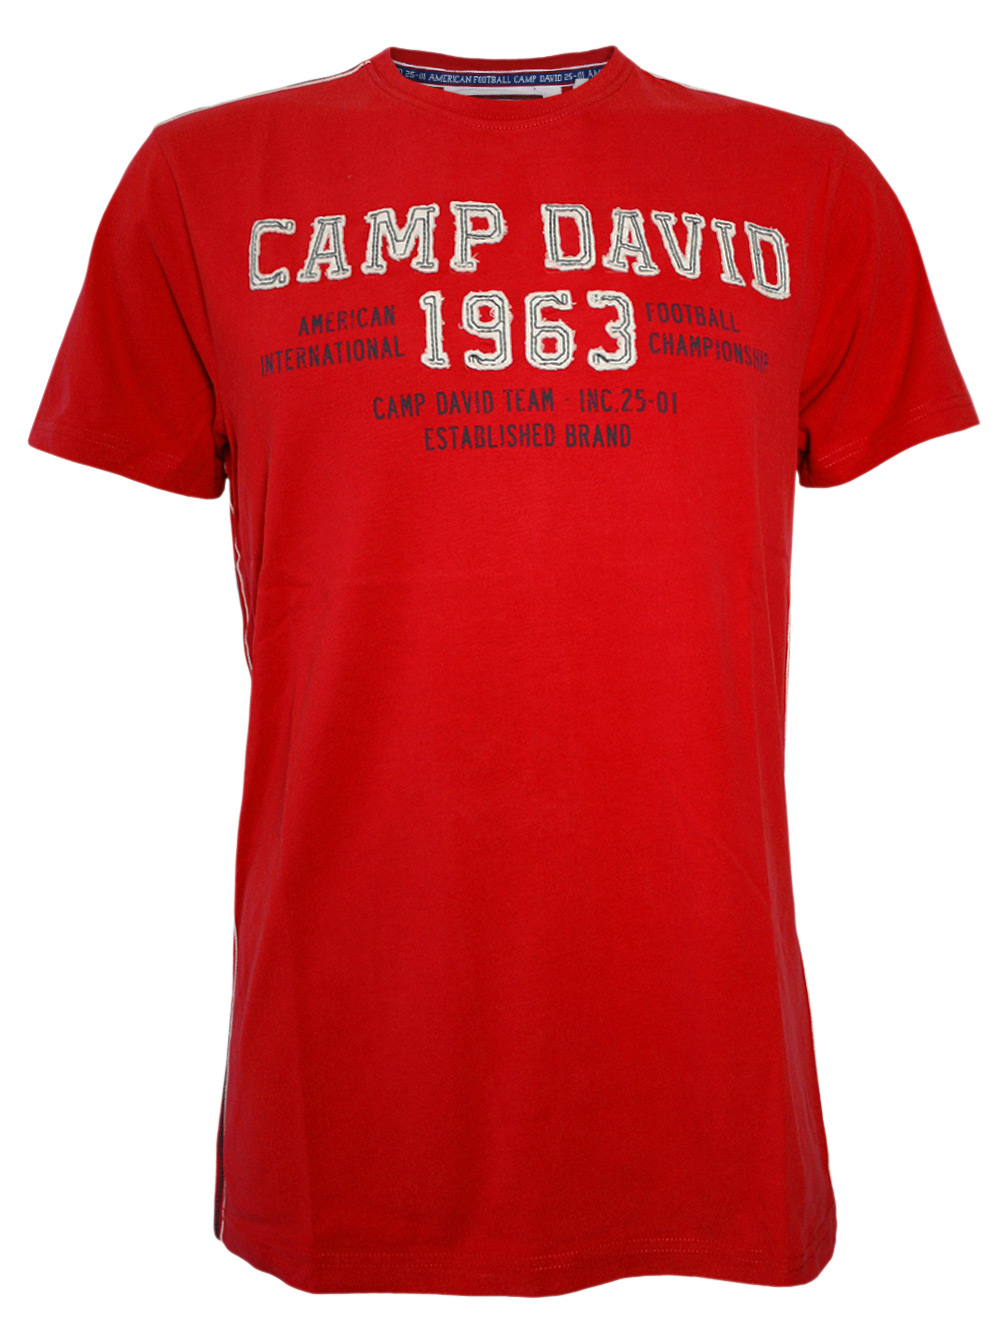 camp david herren t shirt american football in rot neu ebay. Black Bedroom Furniture Sets. Home Design Ideas